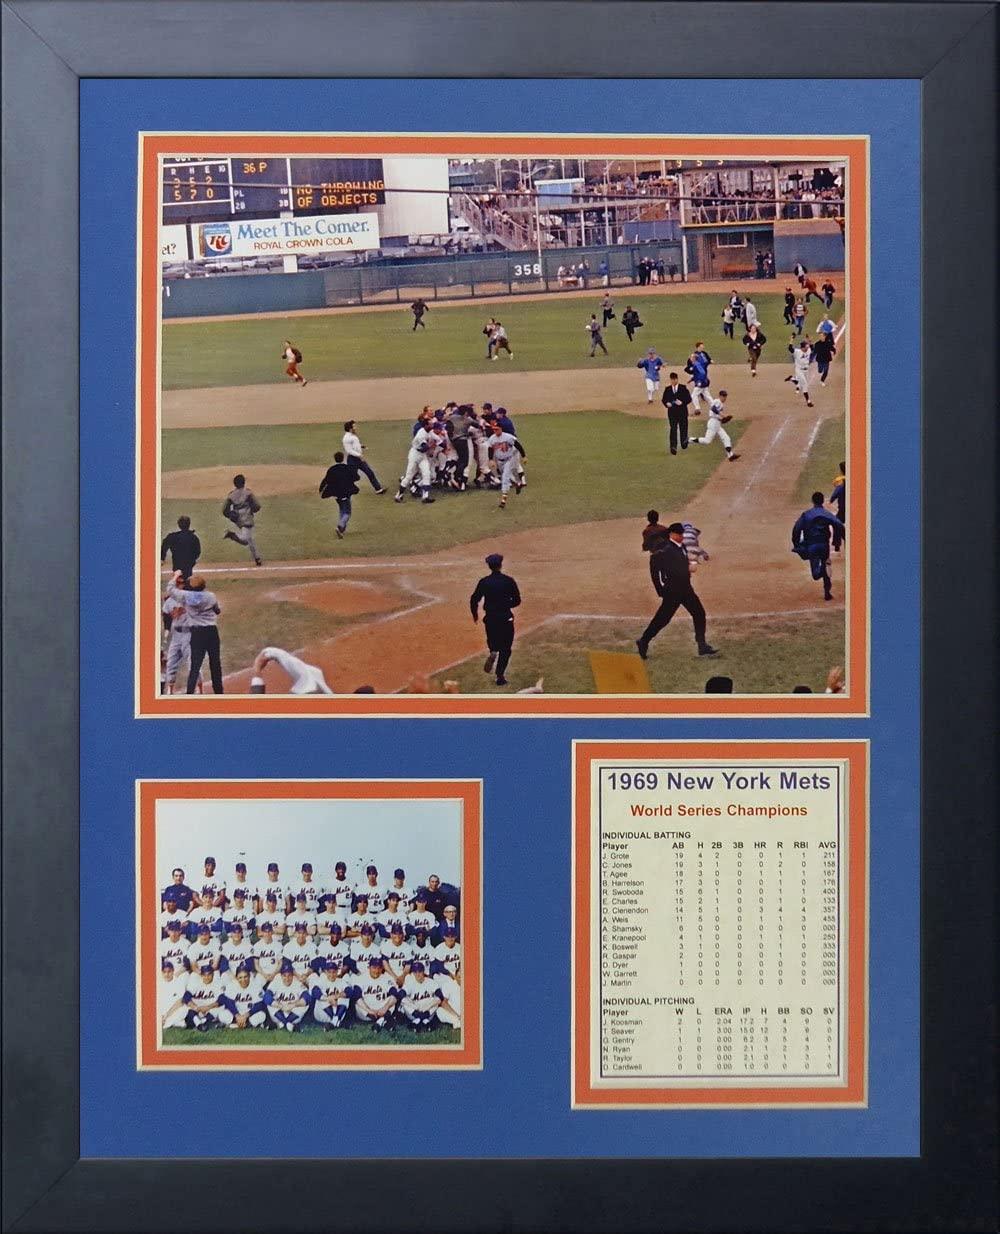 1969 New York Mets - Celebration 11